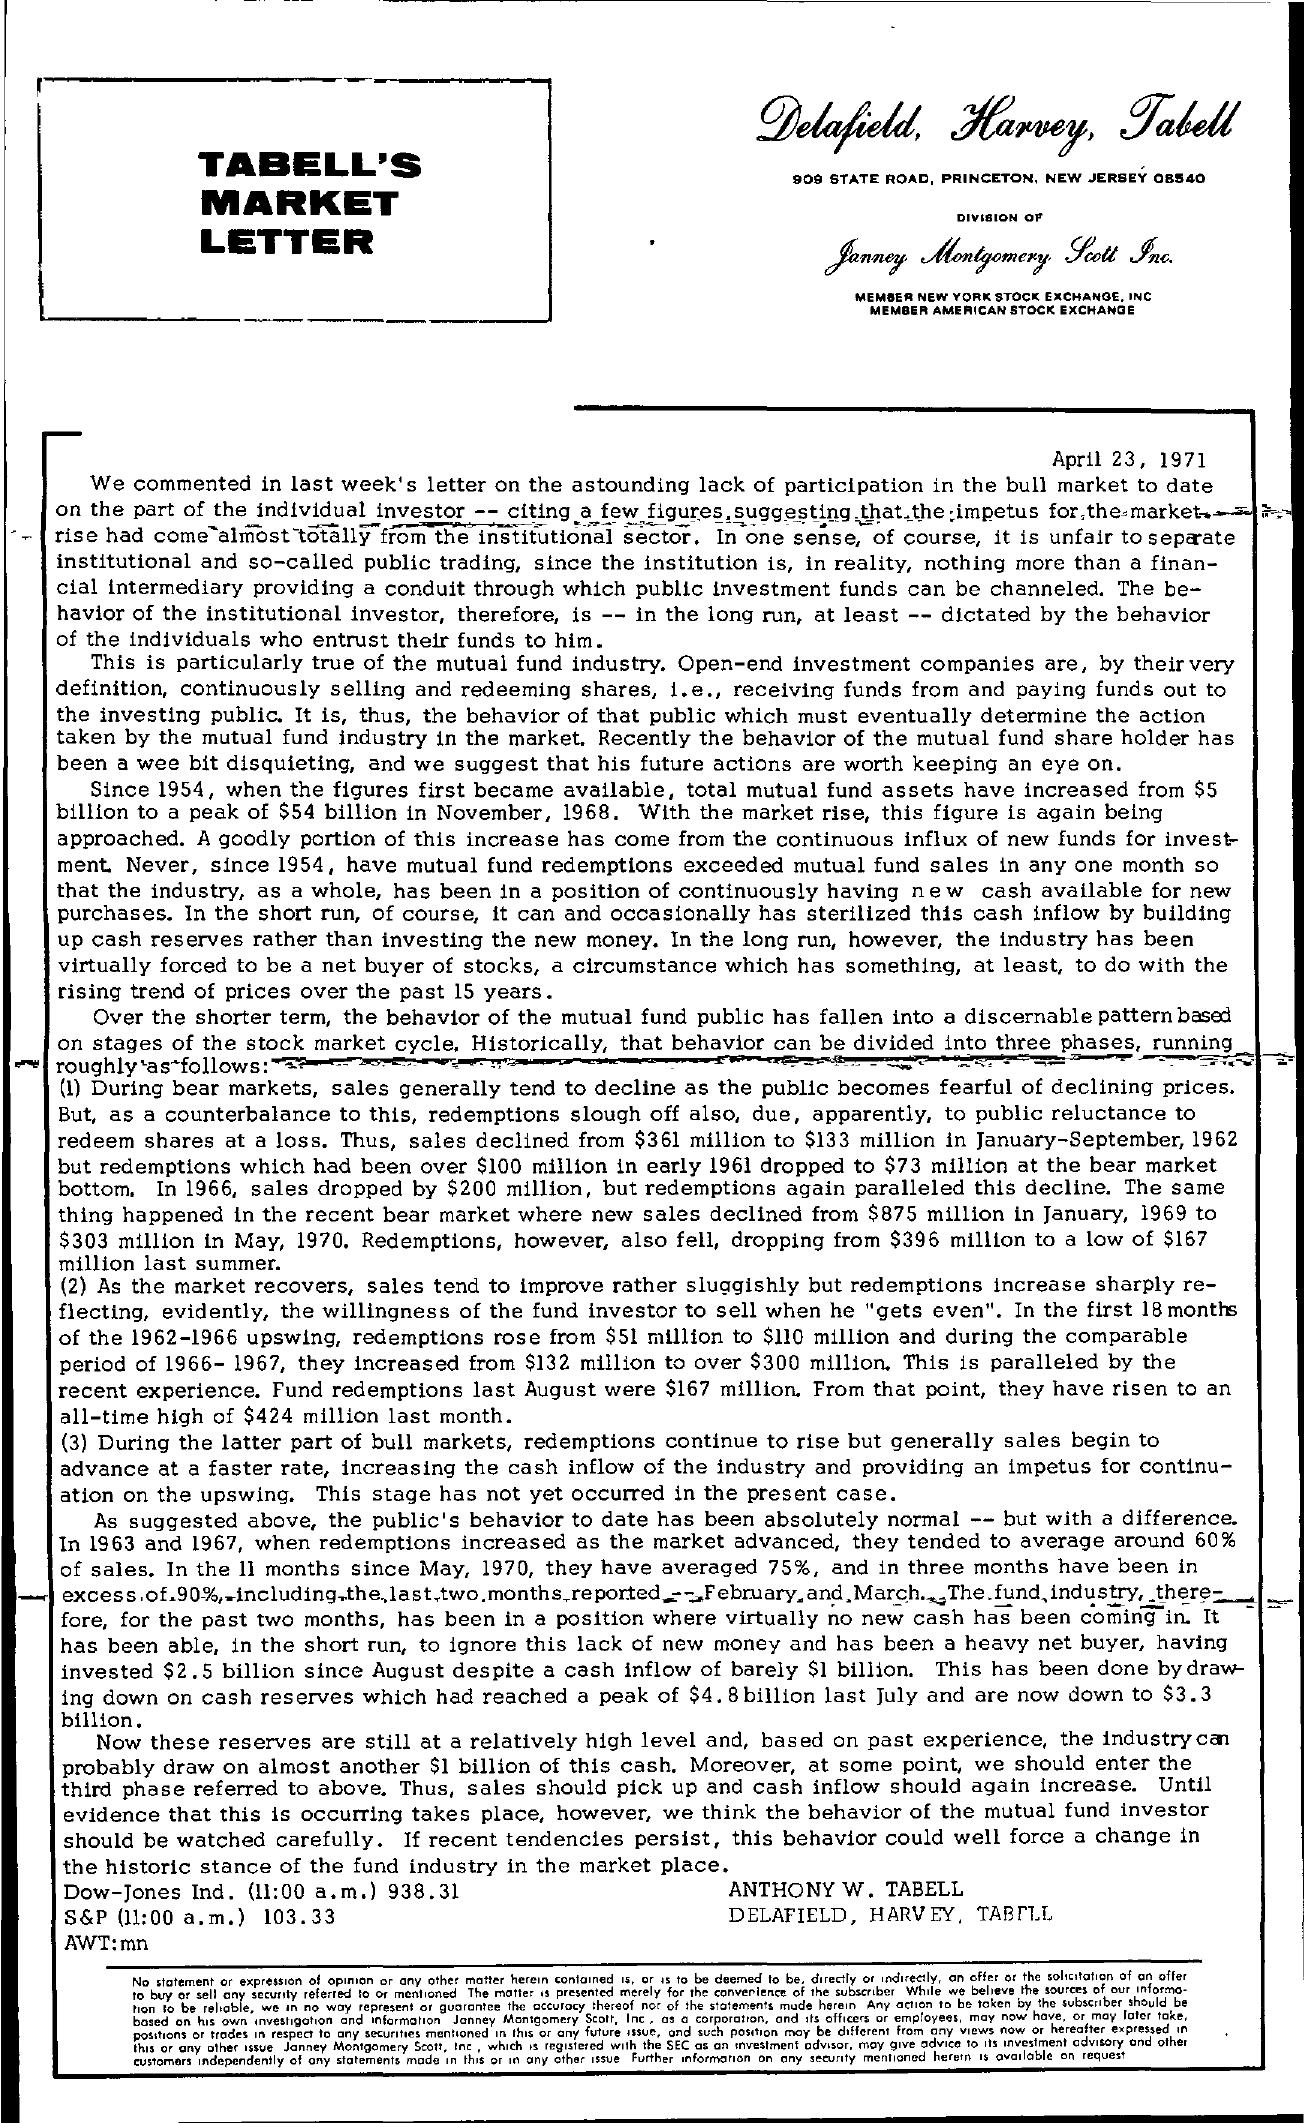 Tabell's Market Letter - April 23, 1971